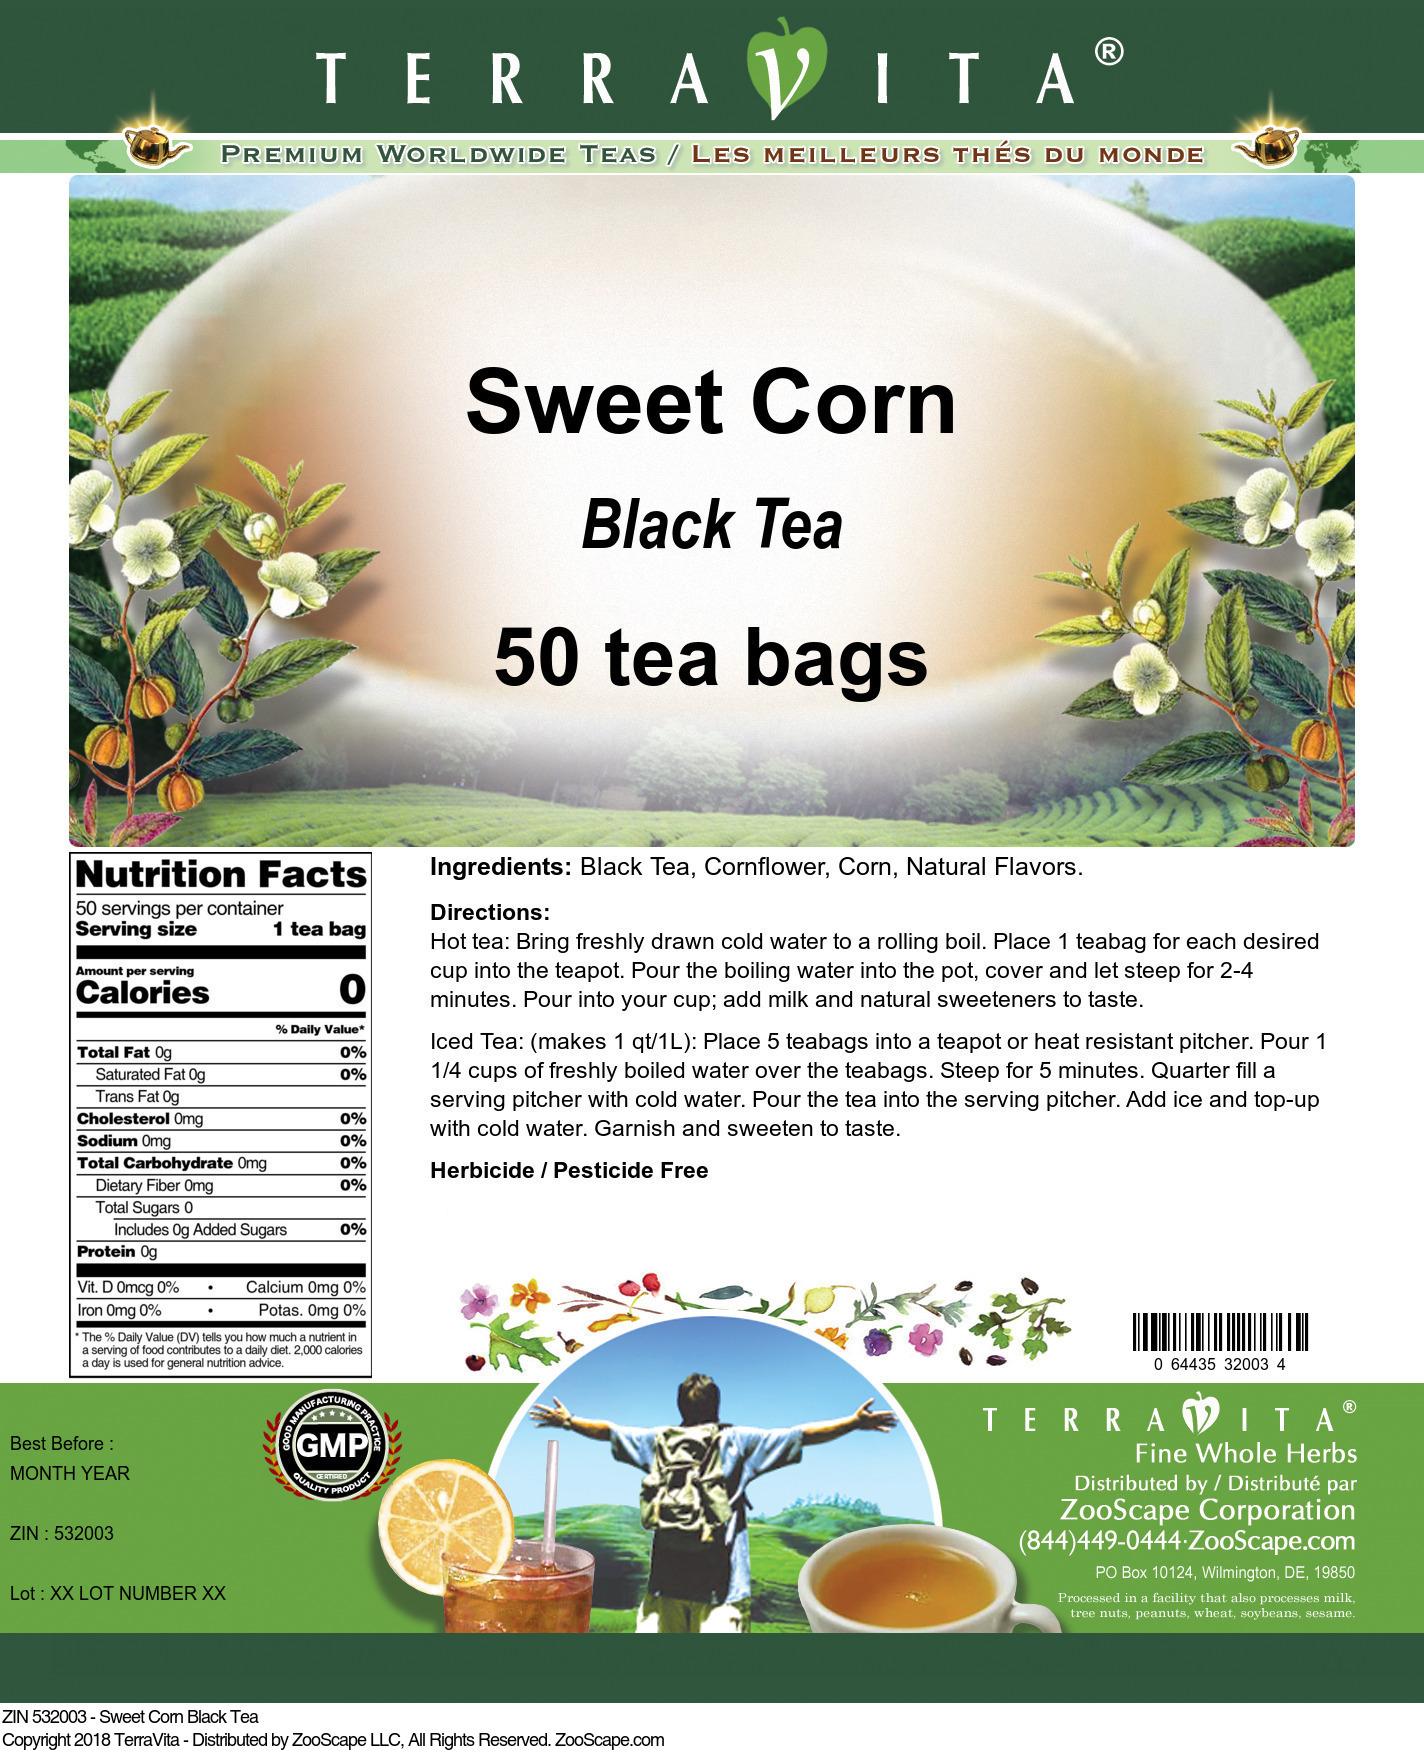 Sweet Corn Black Tea